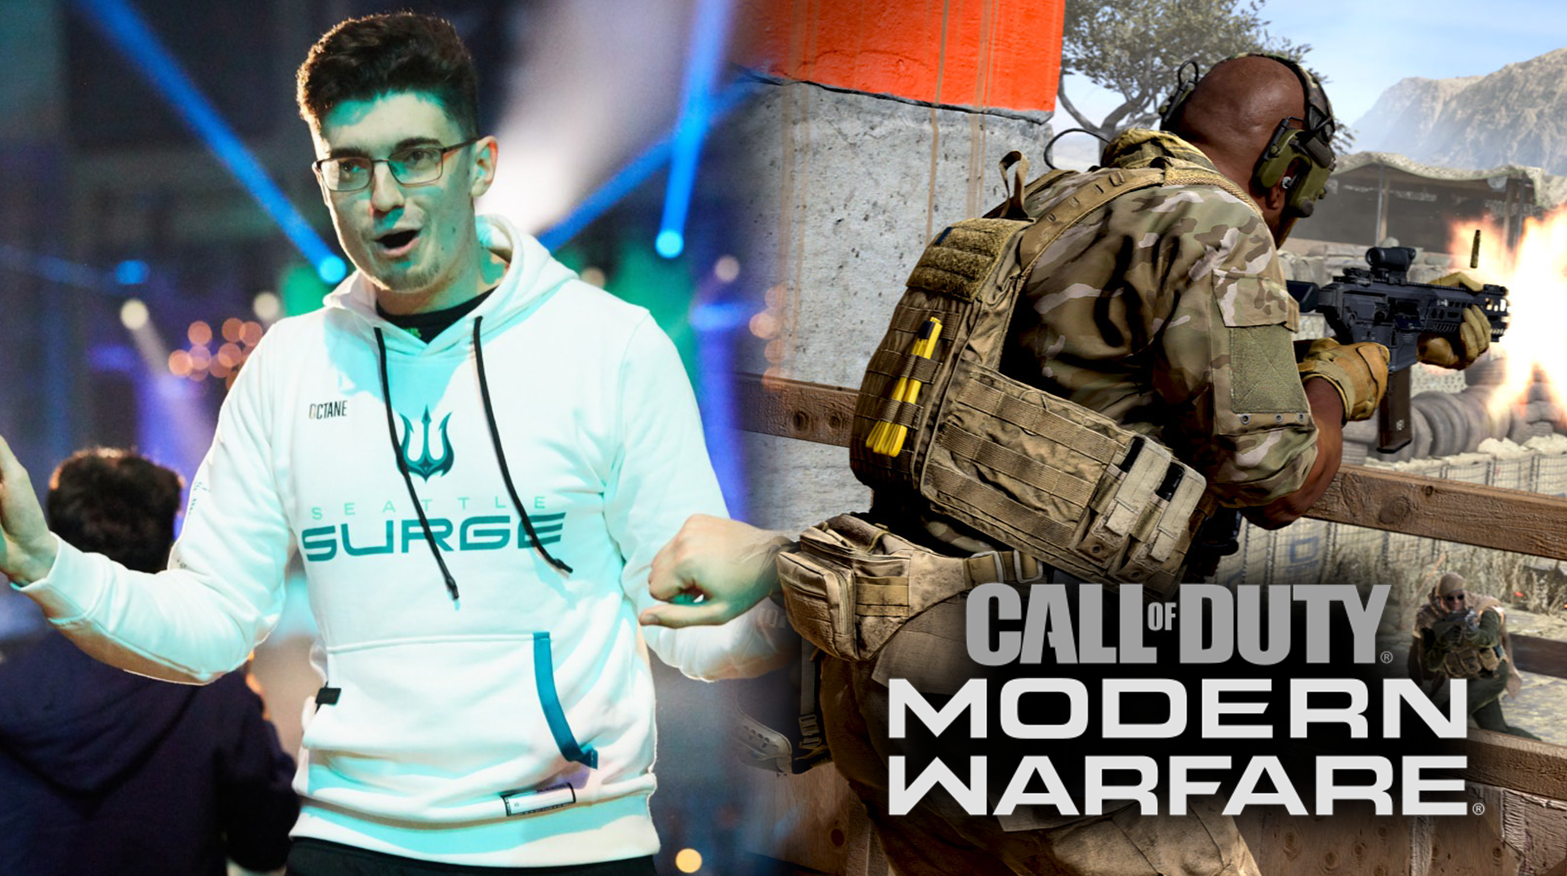 Call of Duty pro Octane / Modern Warfare gameplay